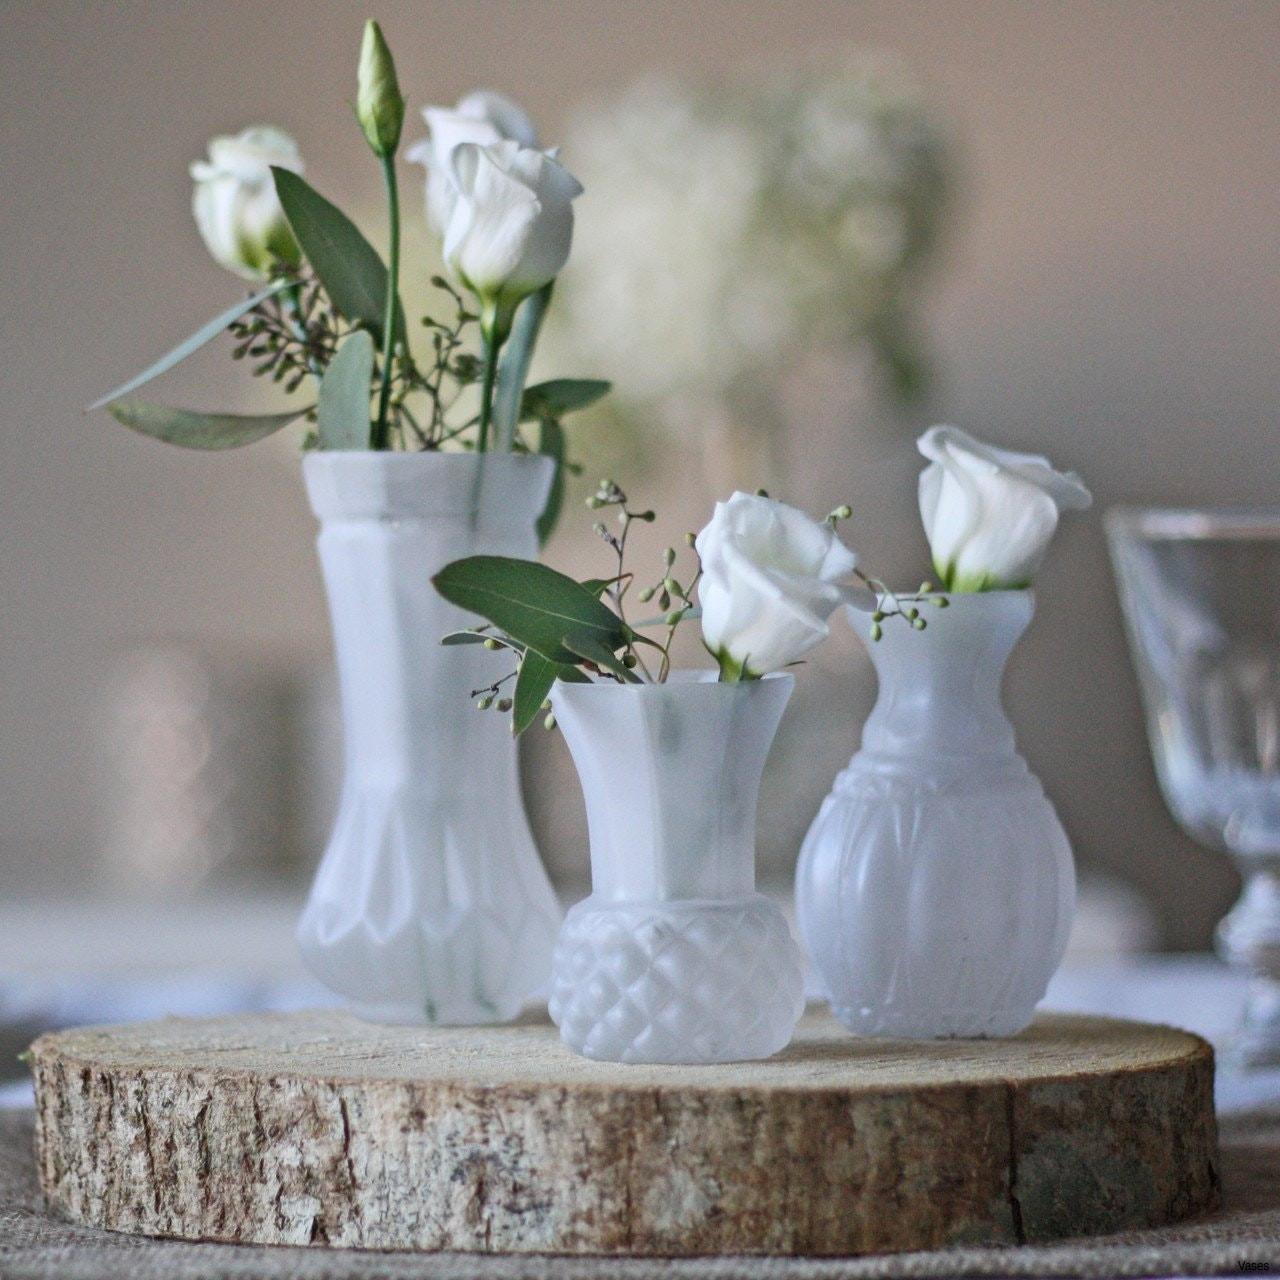 trumpet vase wedding centerpieces of wedding vase centerpieces image jar flower 1h vases bud wedding vase within jar flower 1h vases bud wedding vase centerpiece idea i 0d white